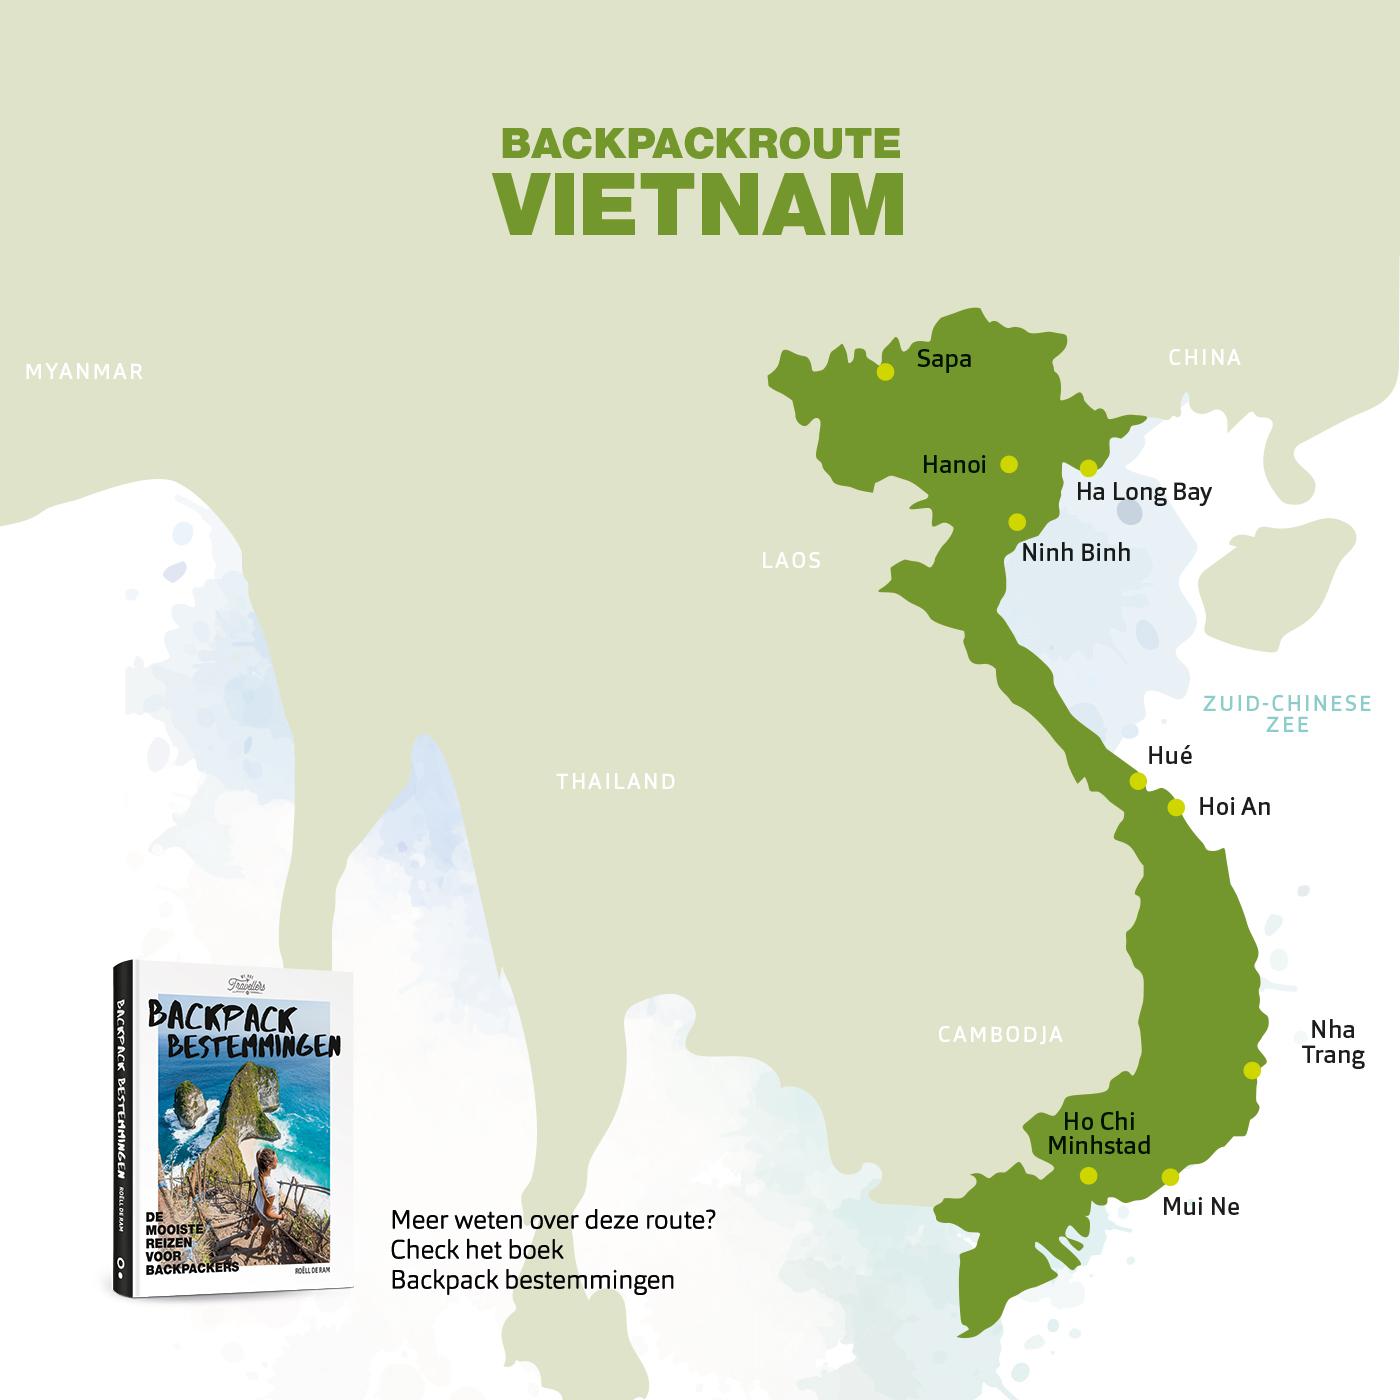 backpack route vietnam boek backpack bestemmingen